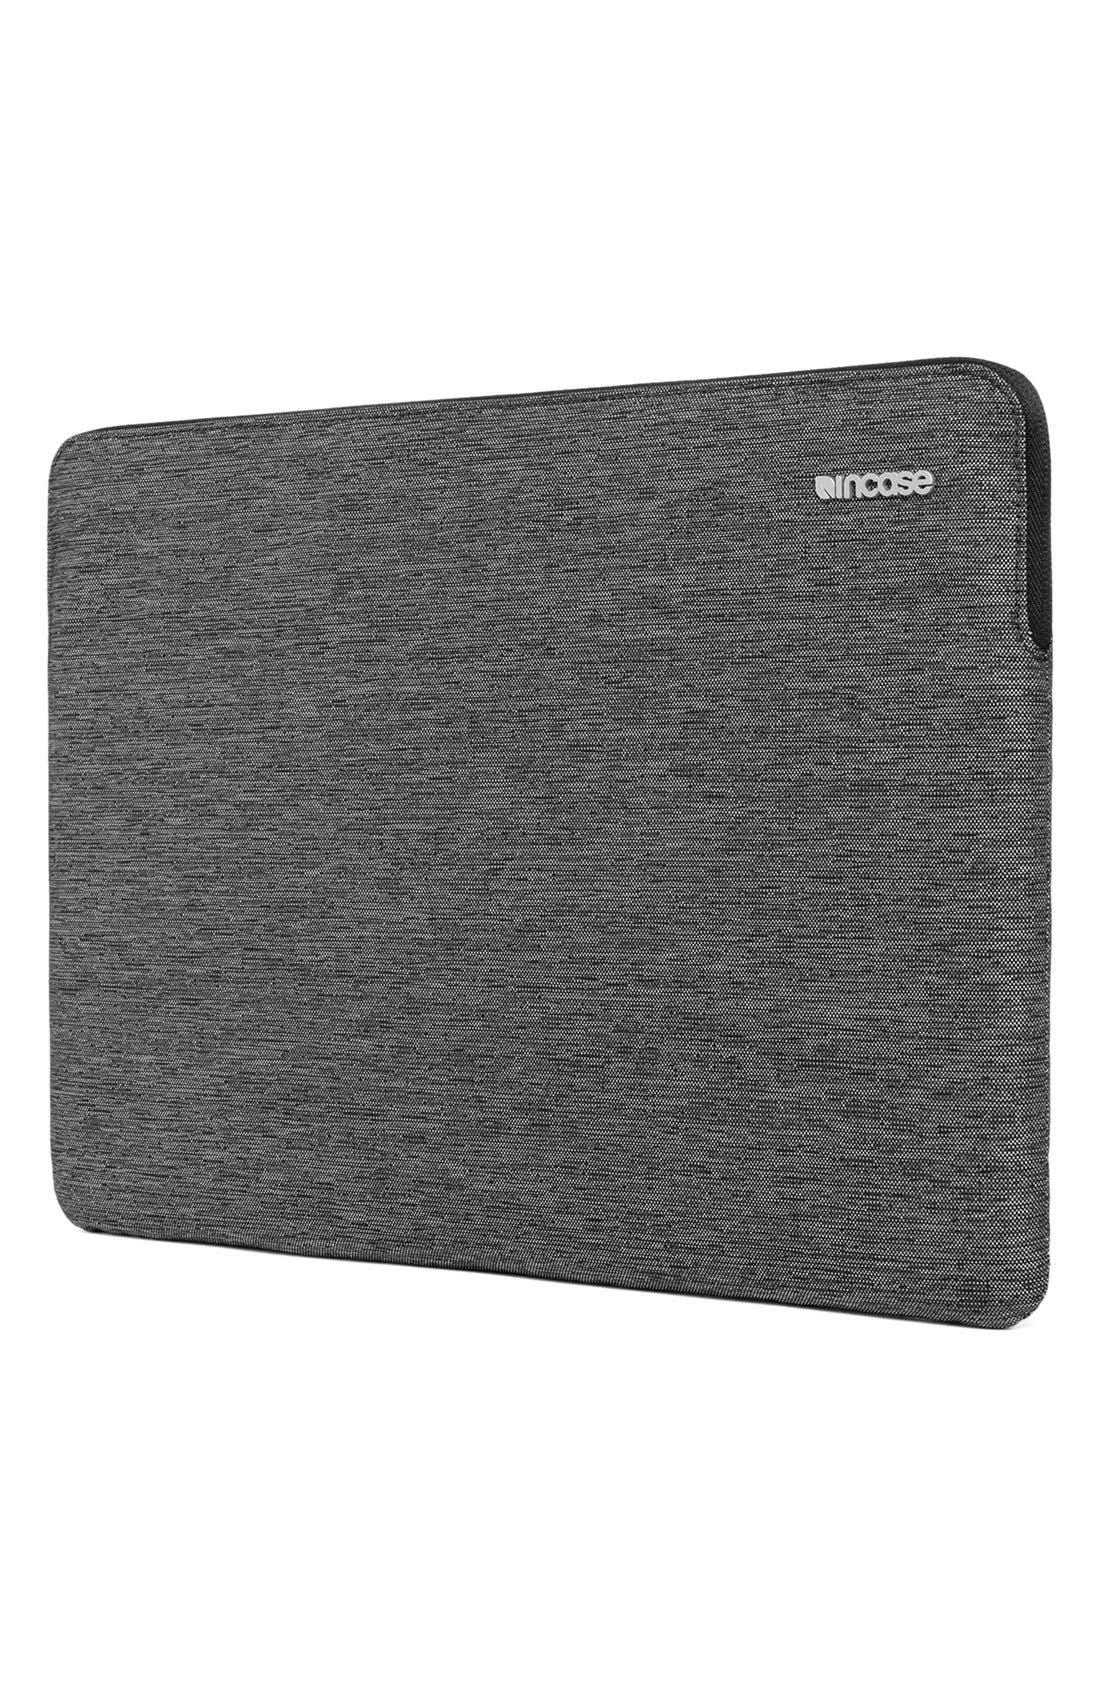 MacBook Air Sleeve,                             Alternate thumbnail 5, color,                             HEATHER  BLACK